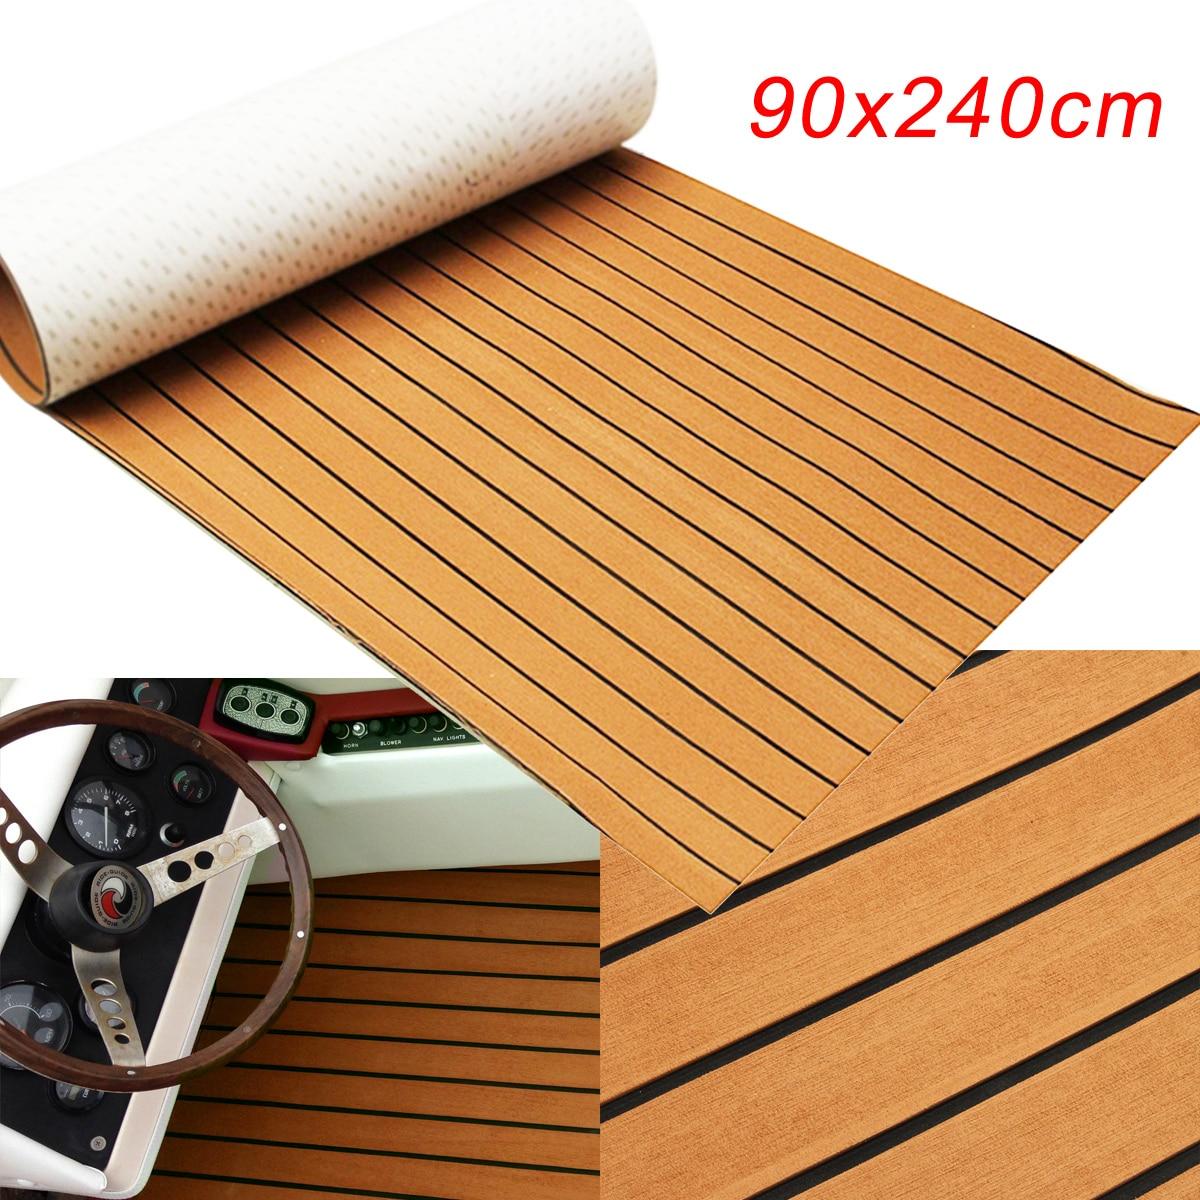 1PC 240cmx90cmx5mm Self-Adhesive Gold With Black Lines Marine Flooring Faux Teak EVA Foam Boat Decking Sheet